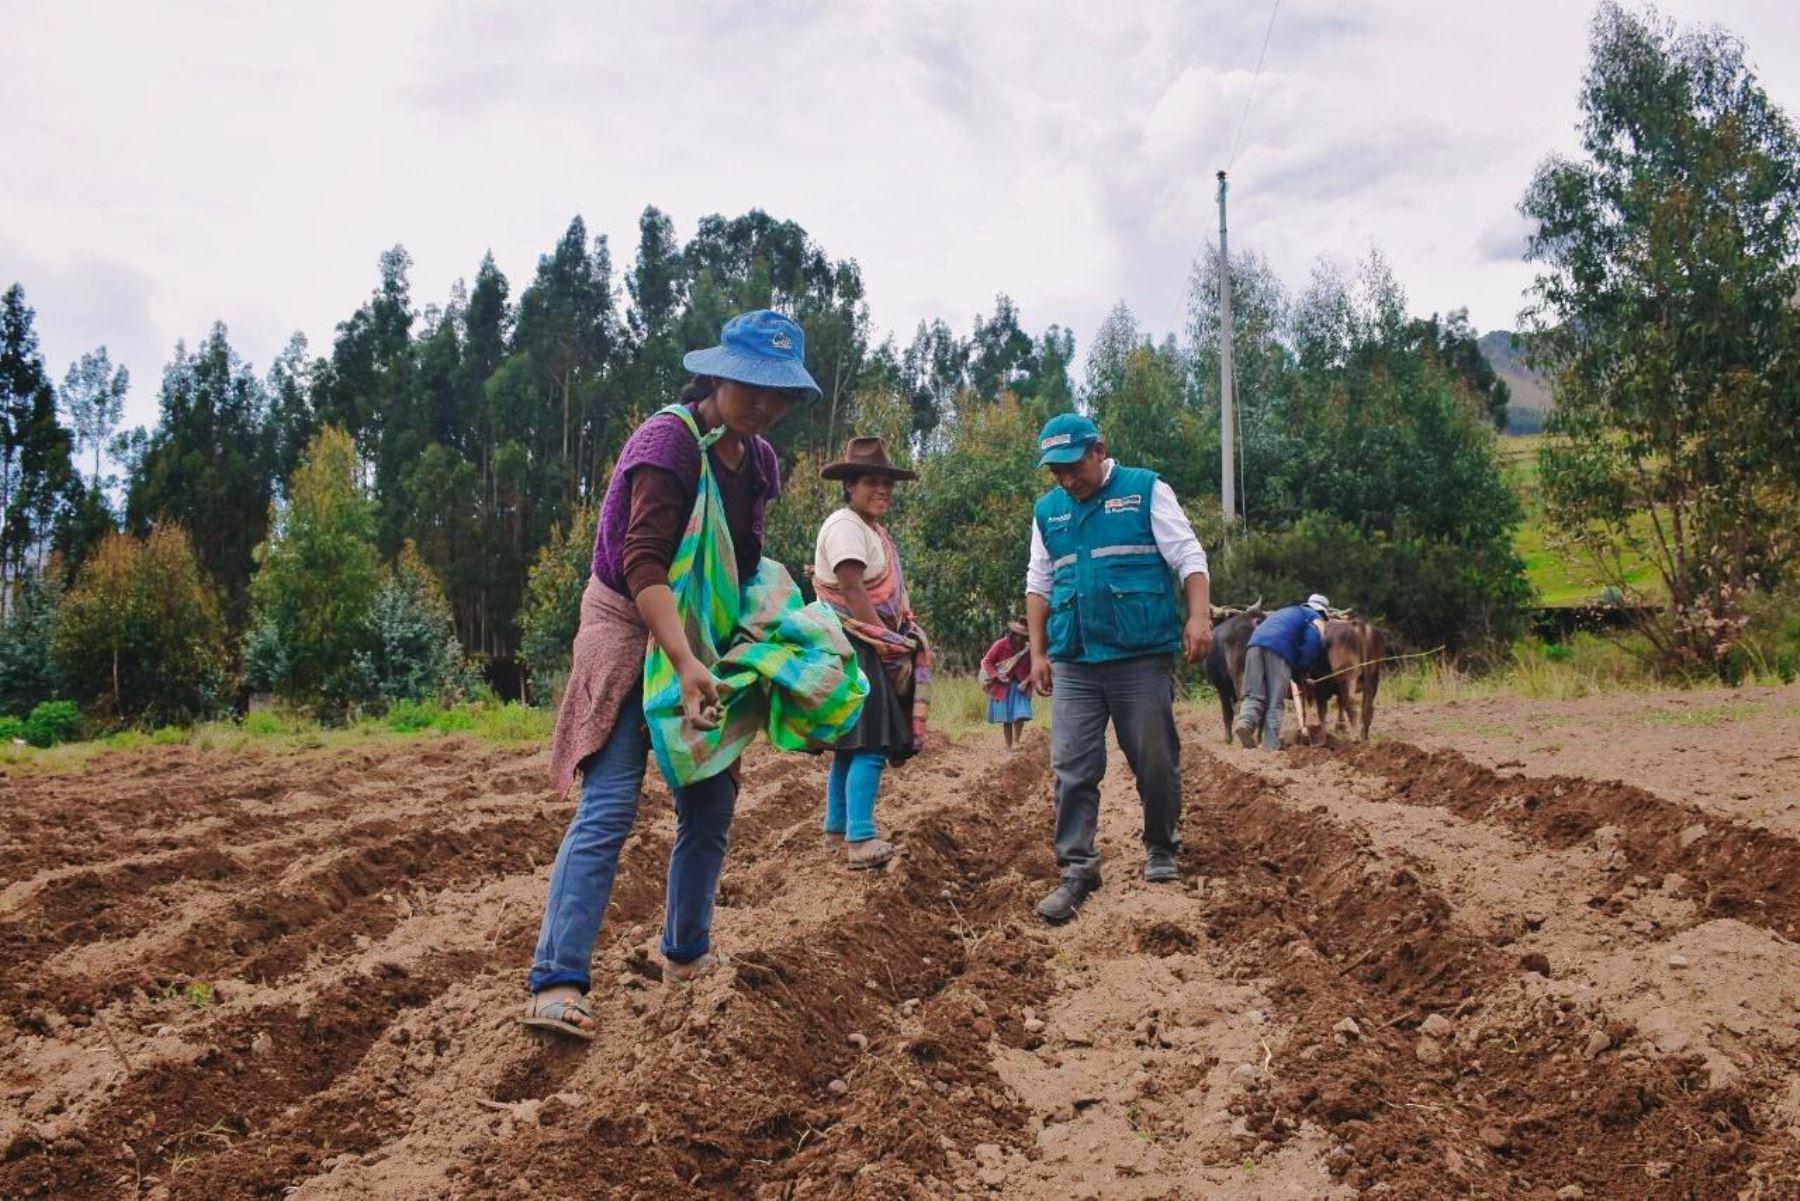 agroexportadoras-podran-usar-services-para-contratar-trabajadores-suplentes